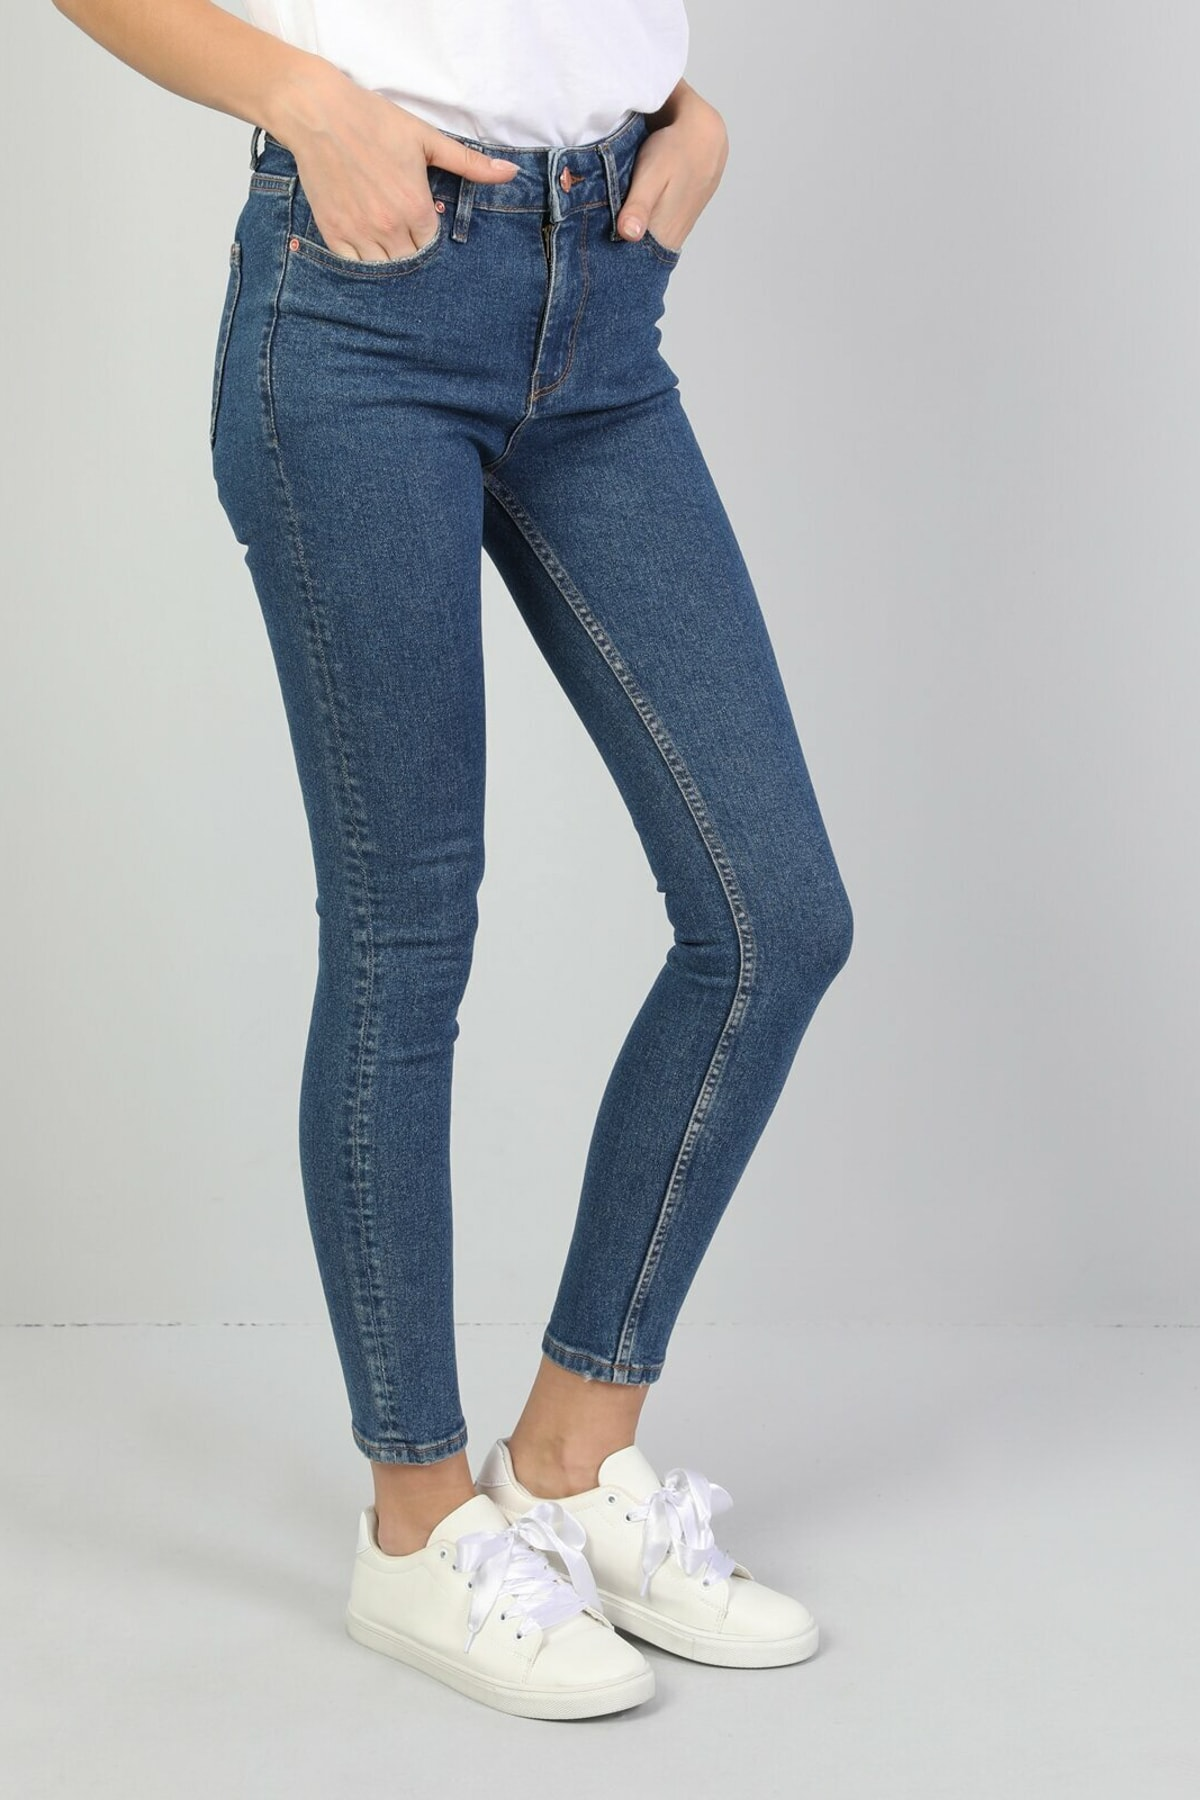 KADIN 759 Lara Orta Bel Dar Paça Super Slim Fit Mavi Kadın Jean Pantolon CL1047044